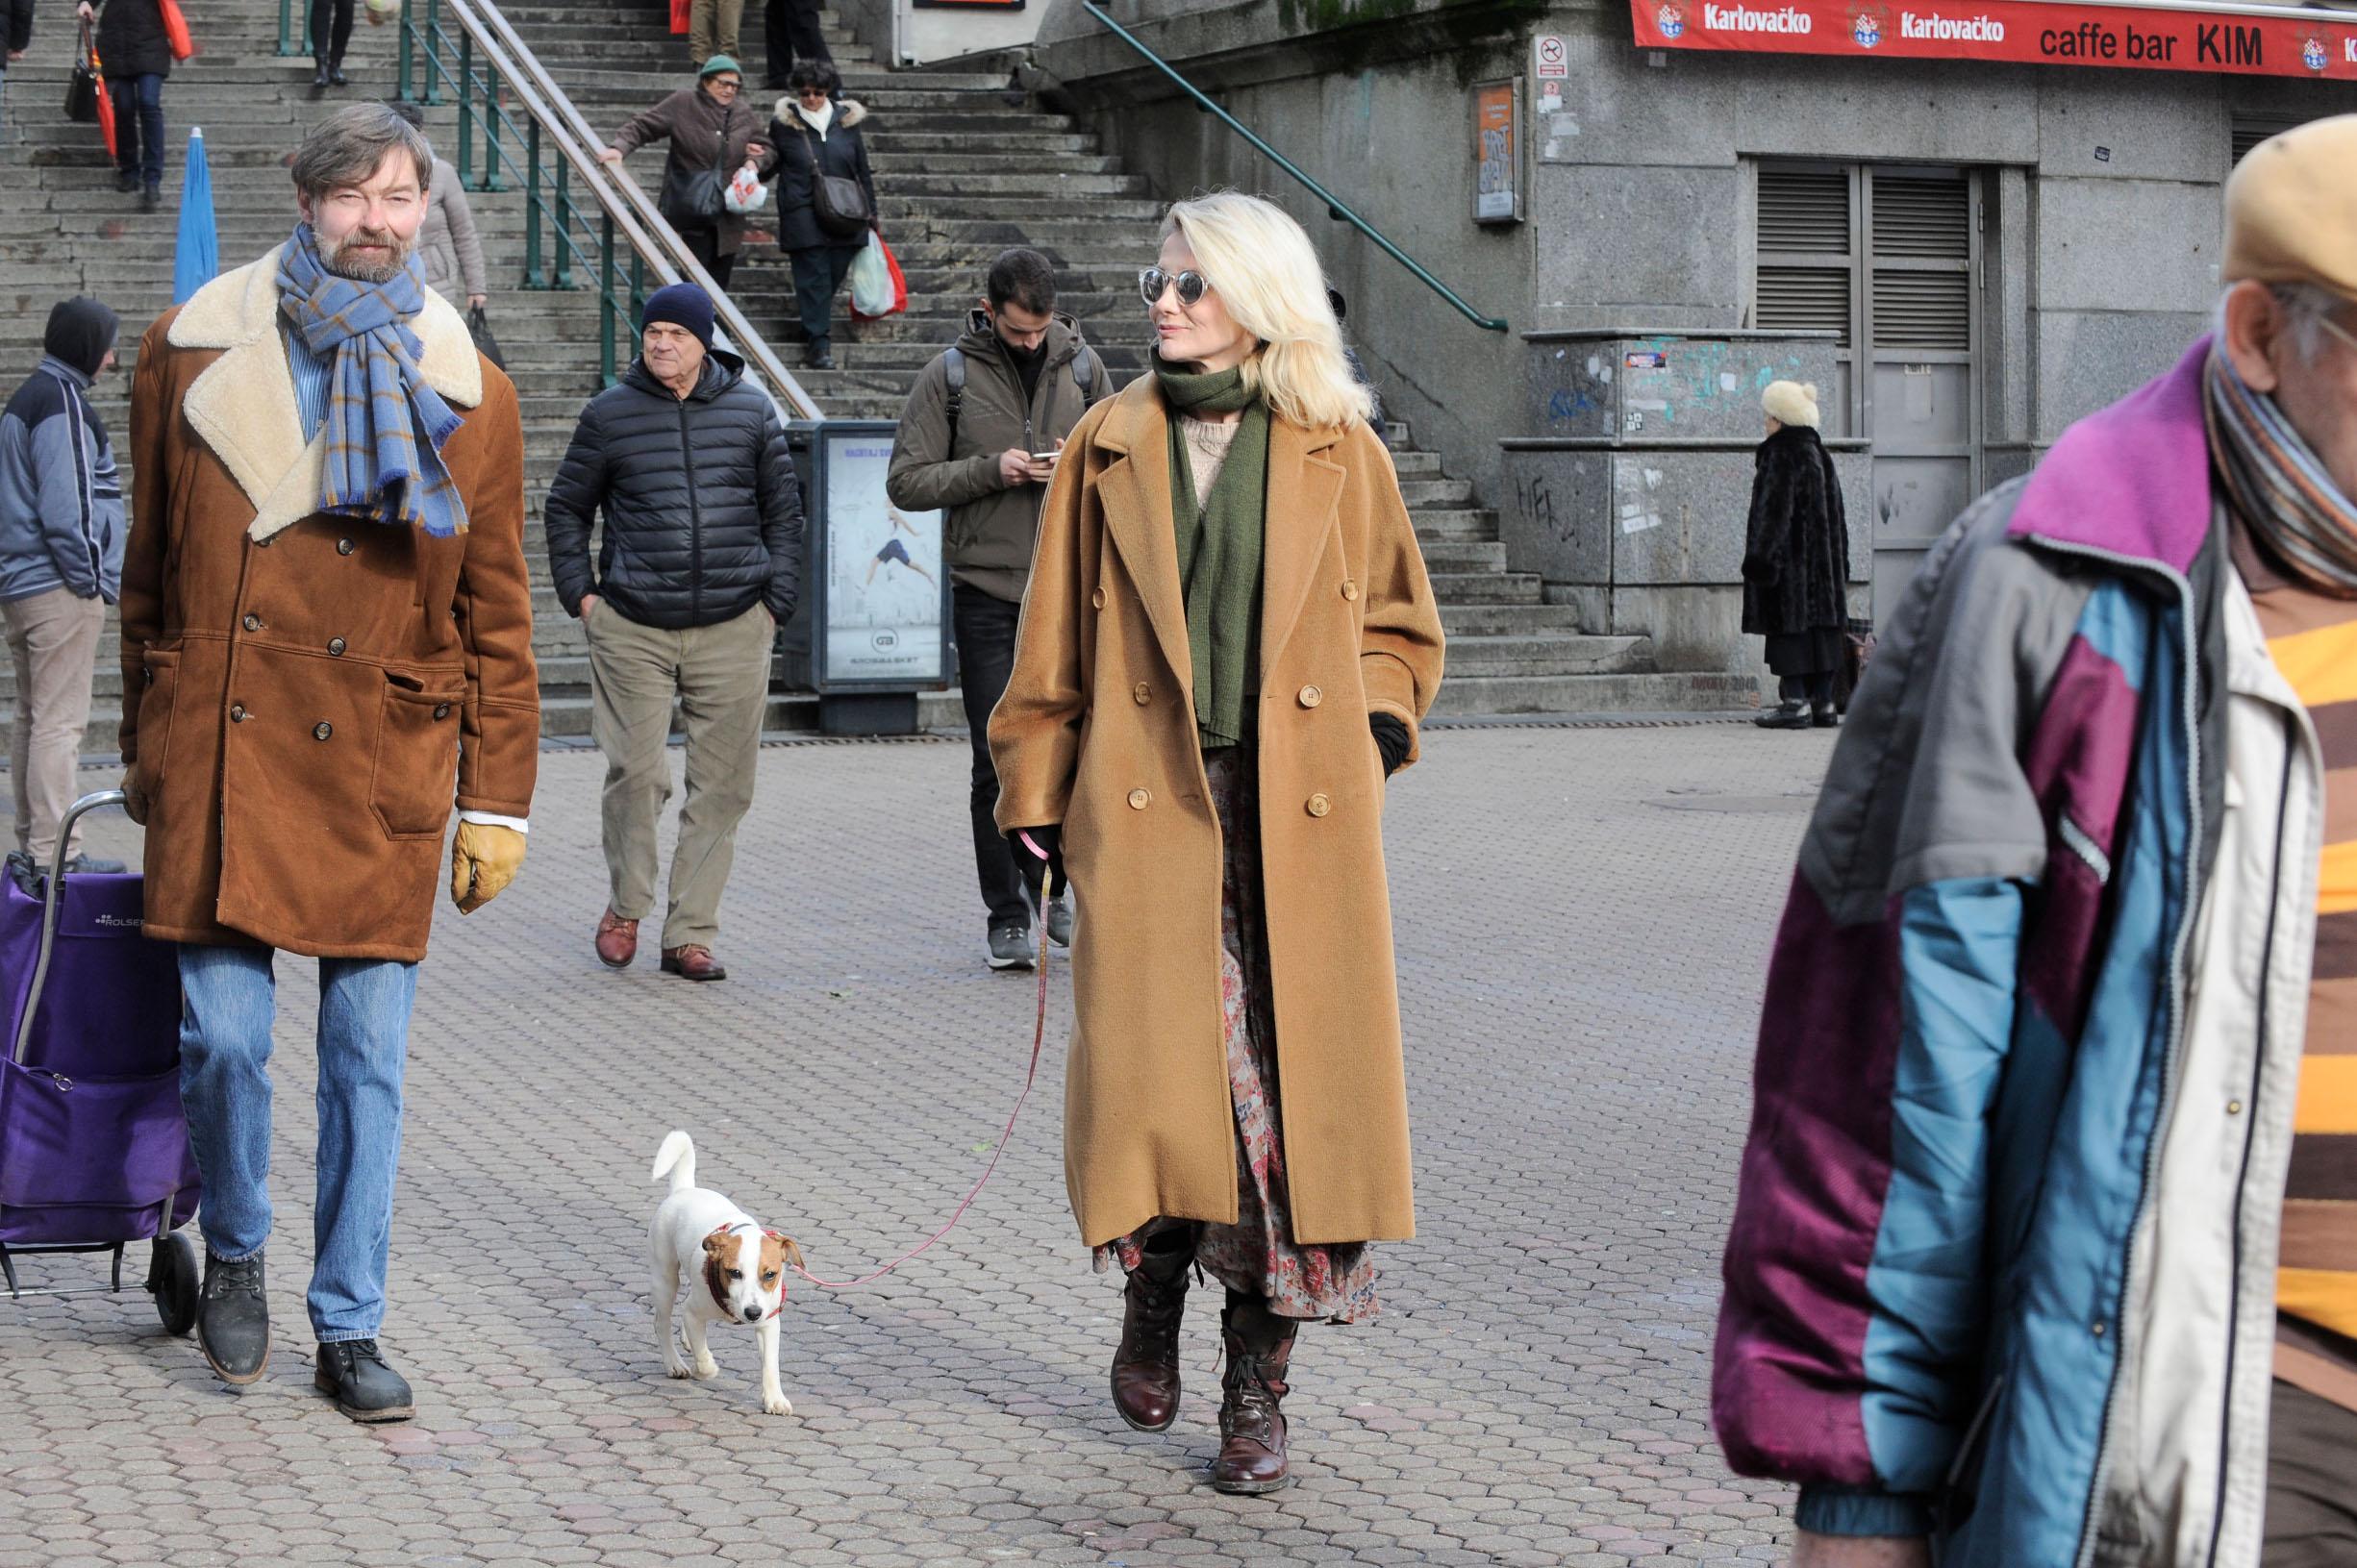 Spica / Zagreb 29.01.2020. / foto: Davor Matota / Barbara Nola i Lukas Nola i pas Maca